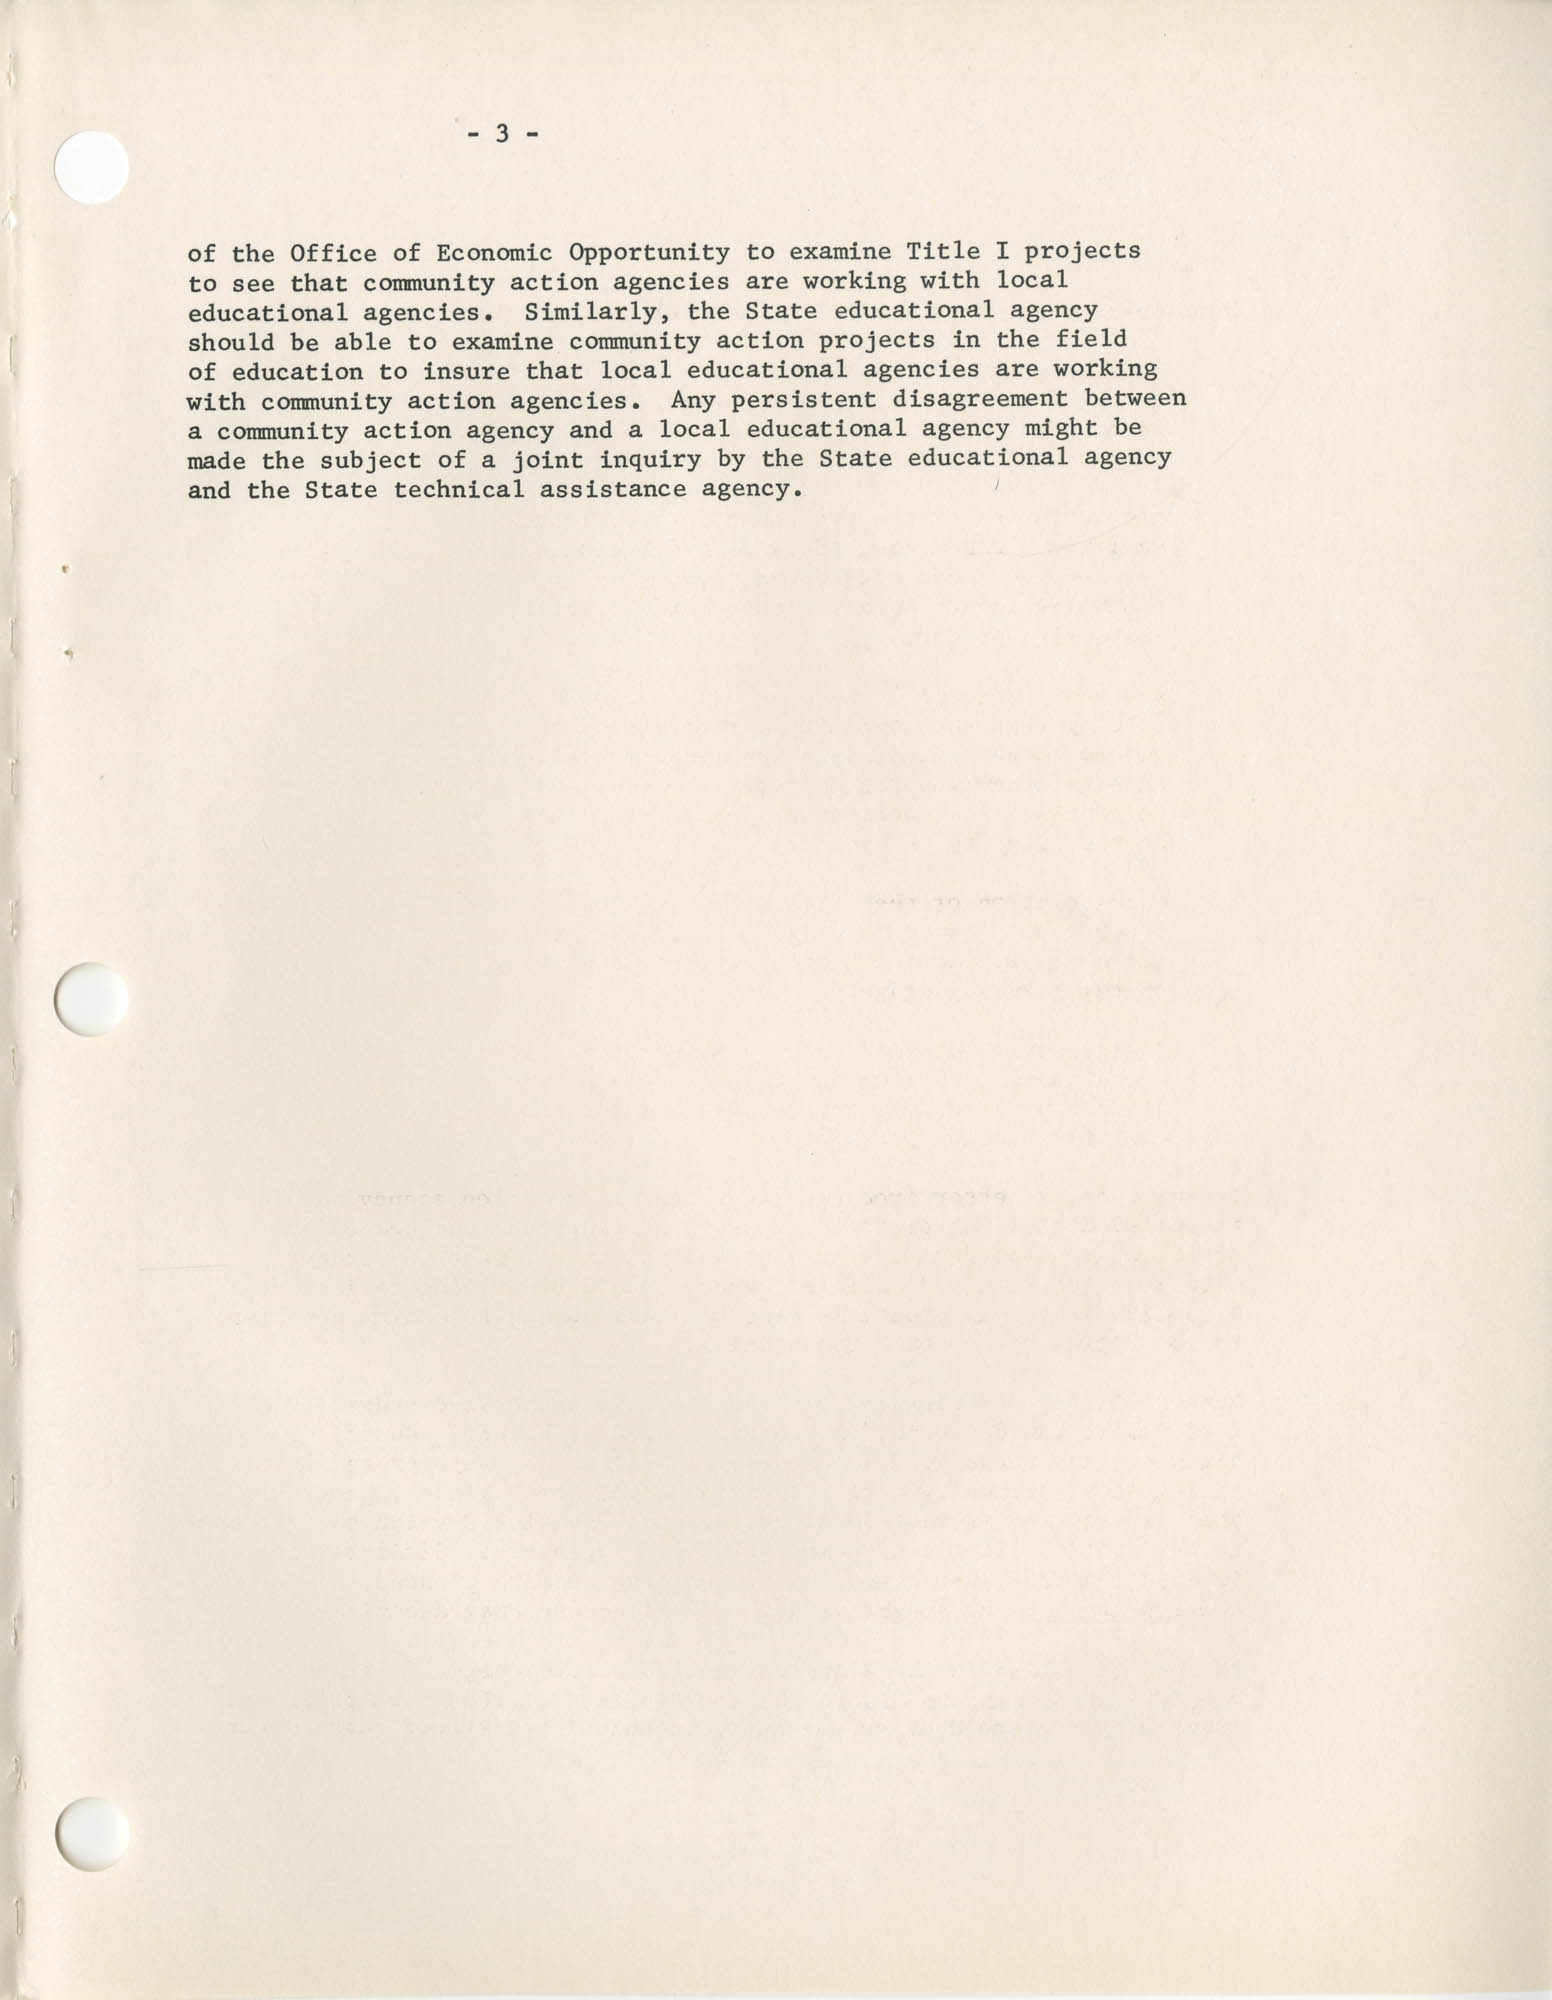 Community Action Program Memorandum No. 27, Exhibit 1 Page 3